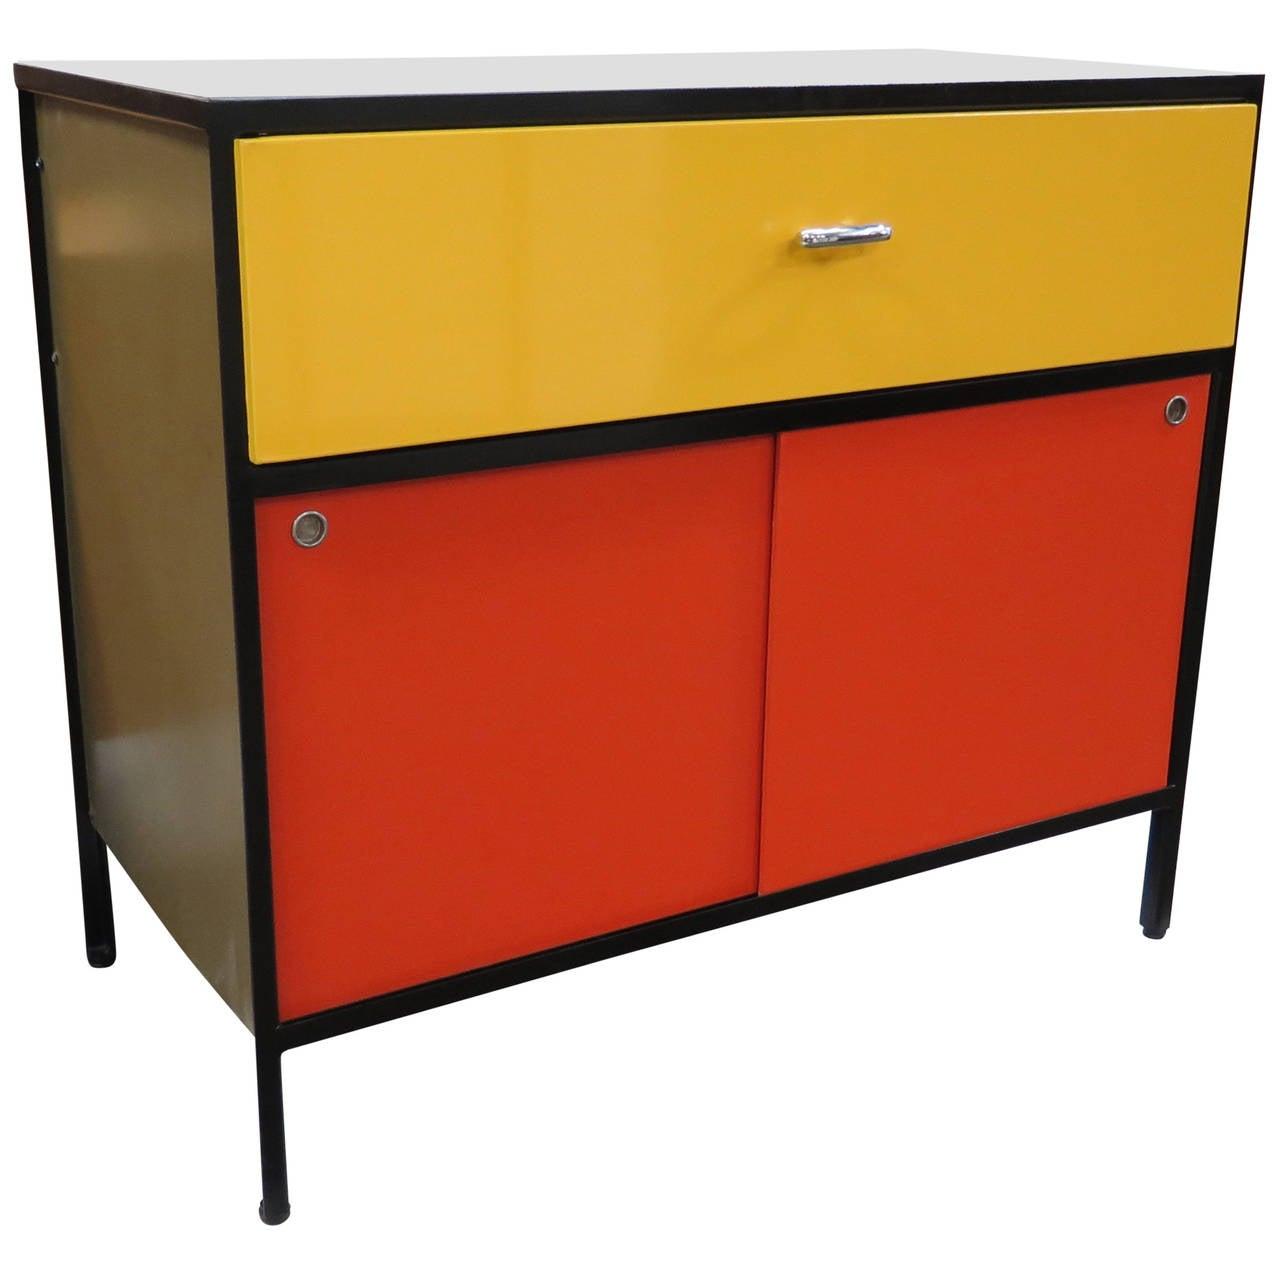 Steel Frame Kitchen Cabinets: Vibrant 1950s George Nelson Steel Frame Cabinet